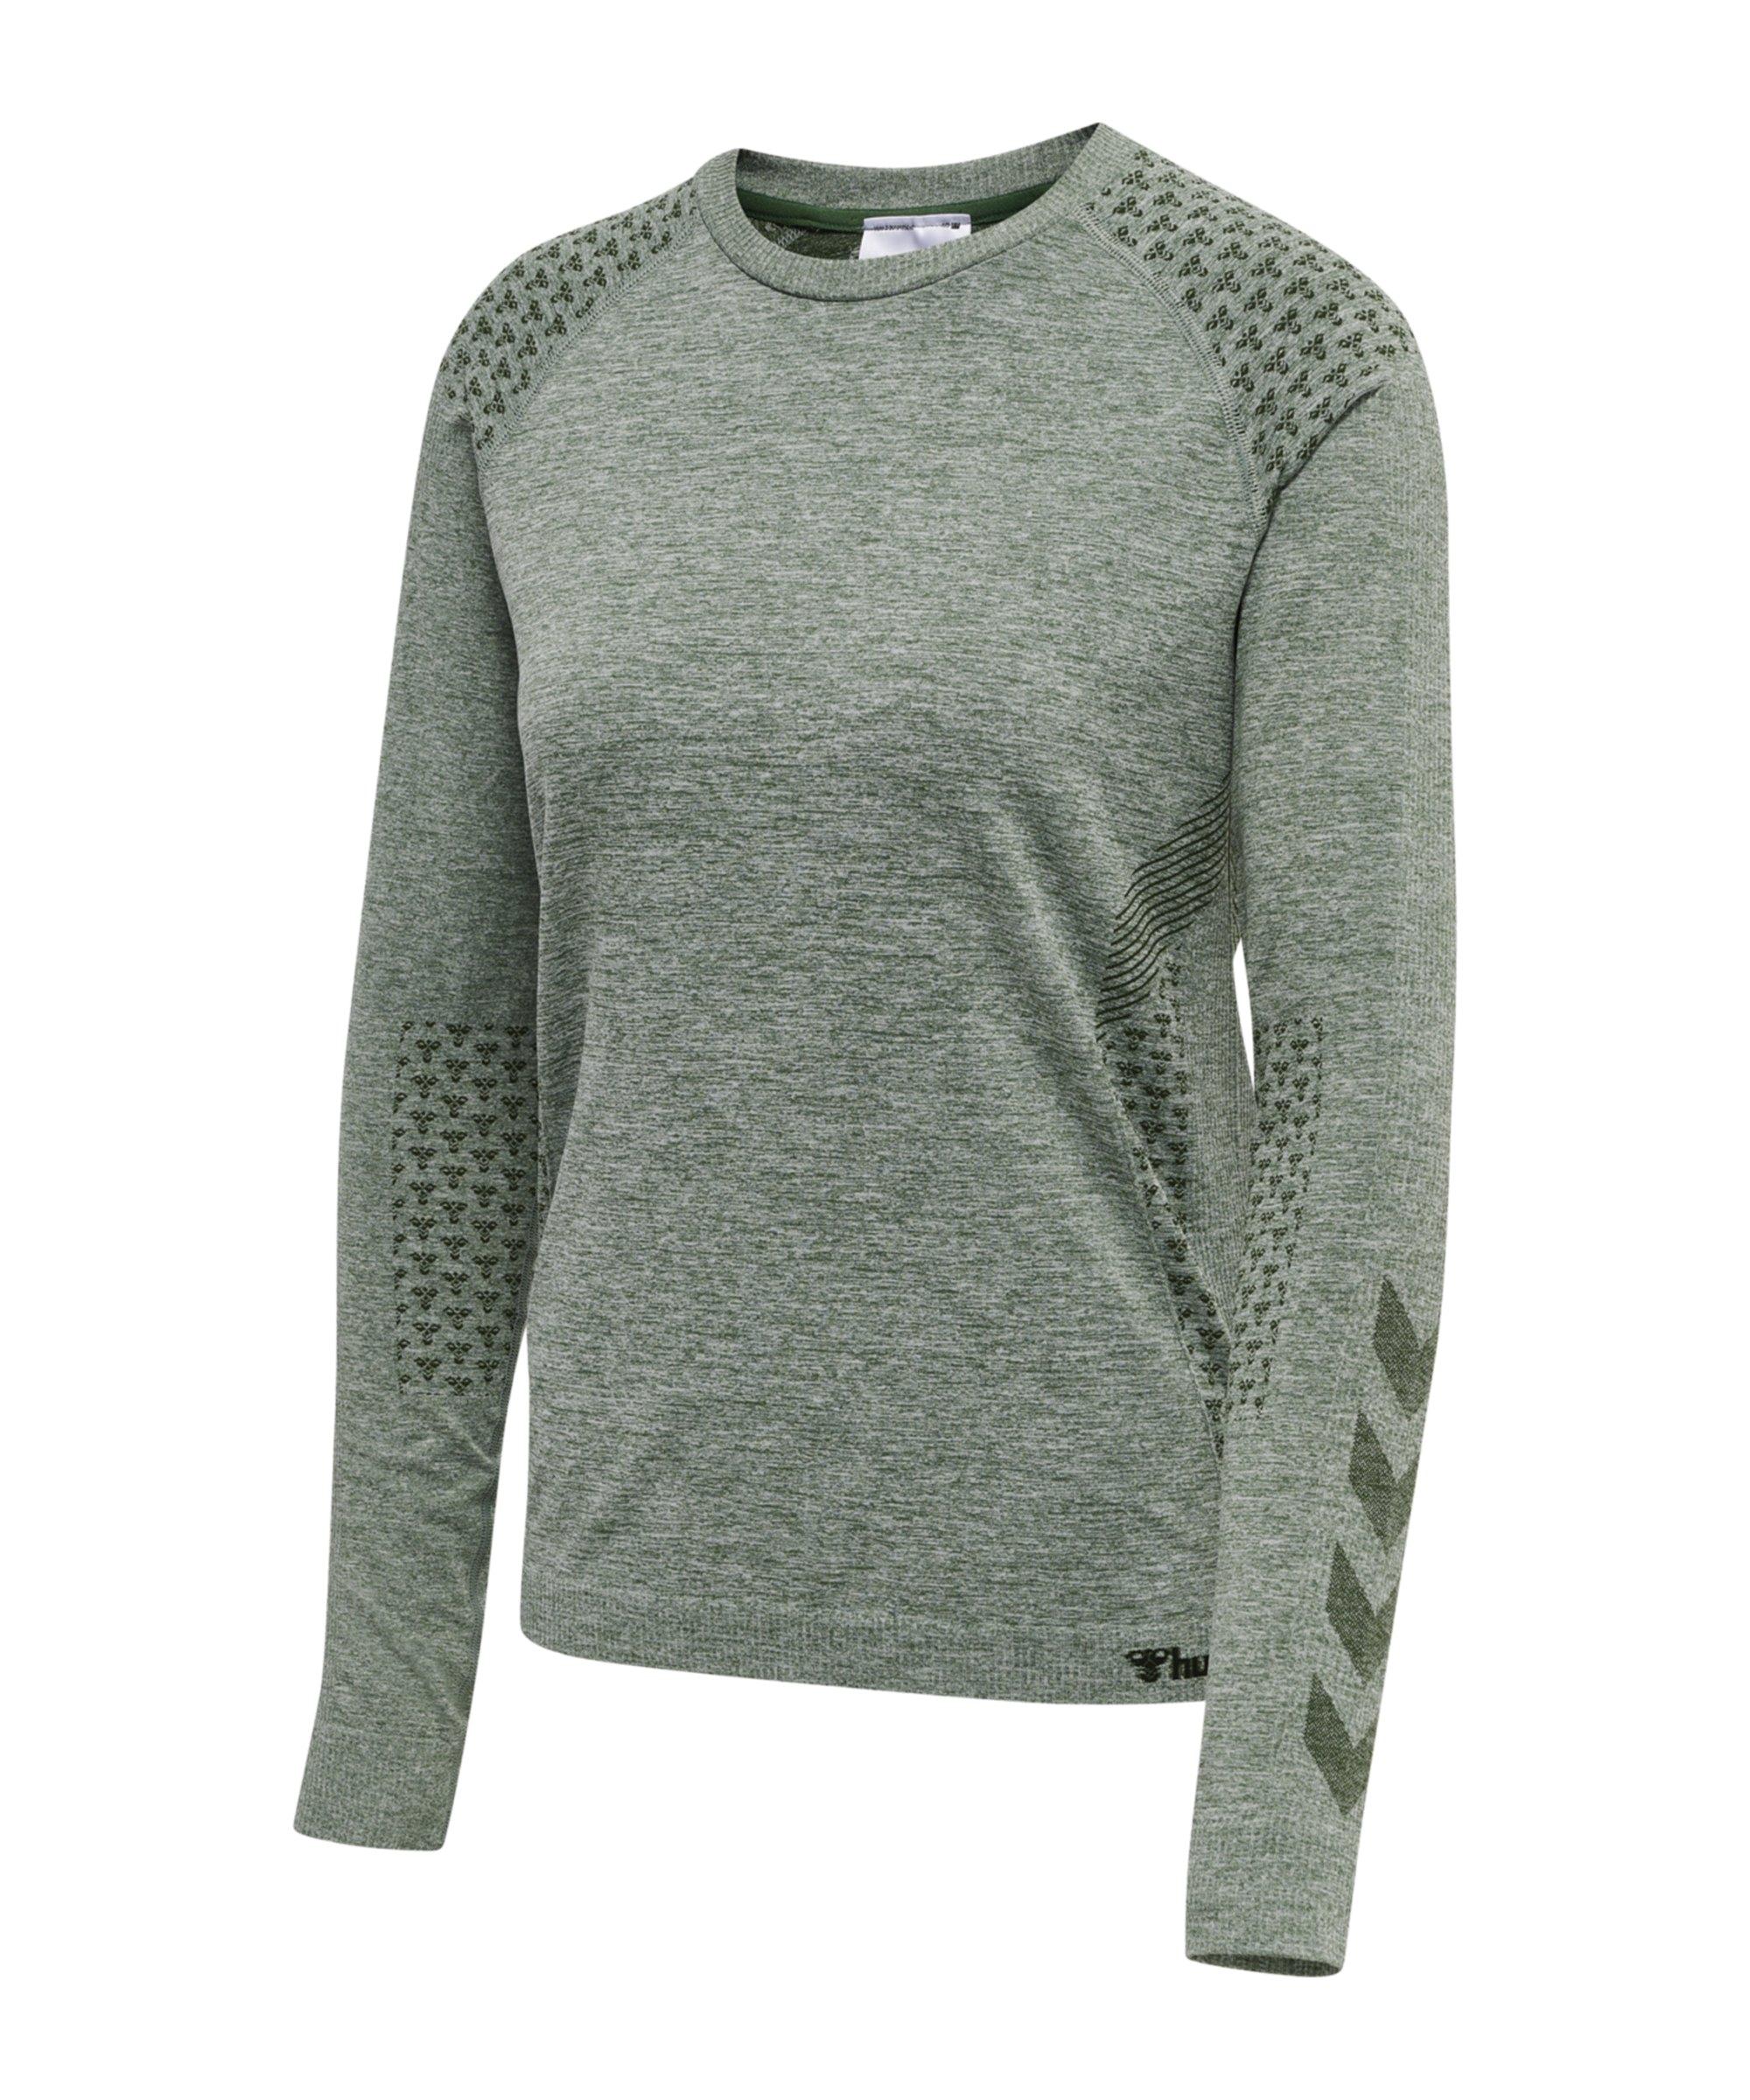 Hummel hmlci Seamless Sweatshirt Damen F6361 - gruen